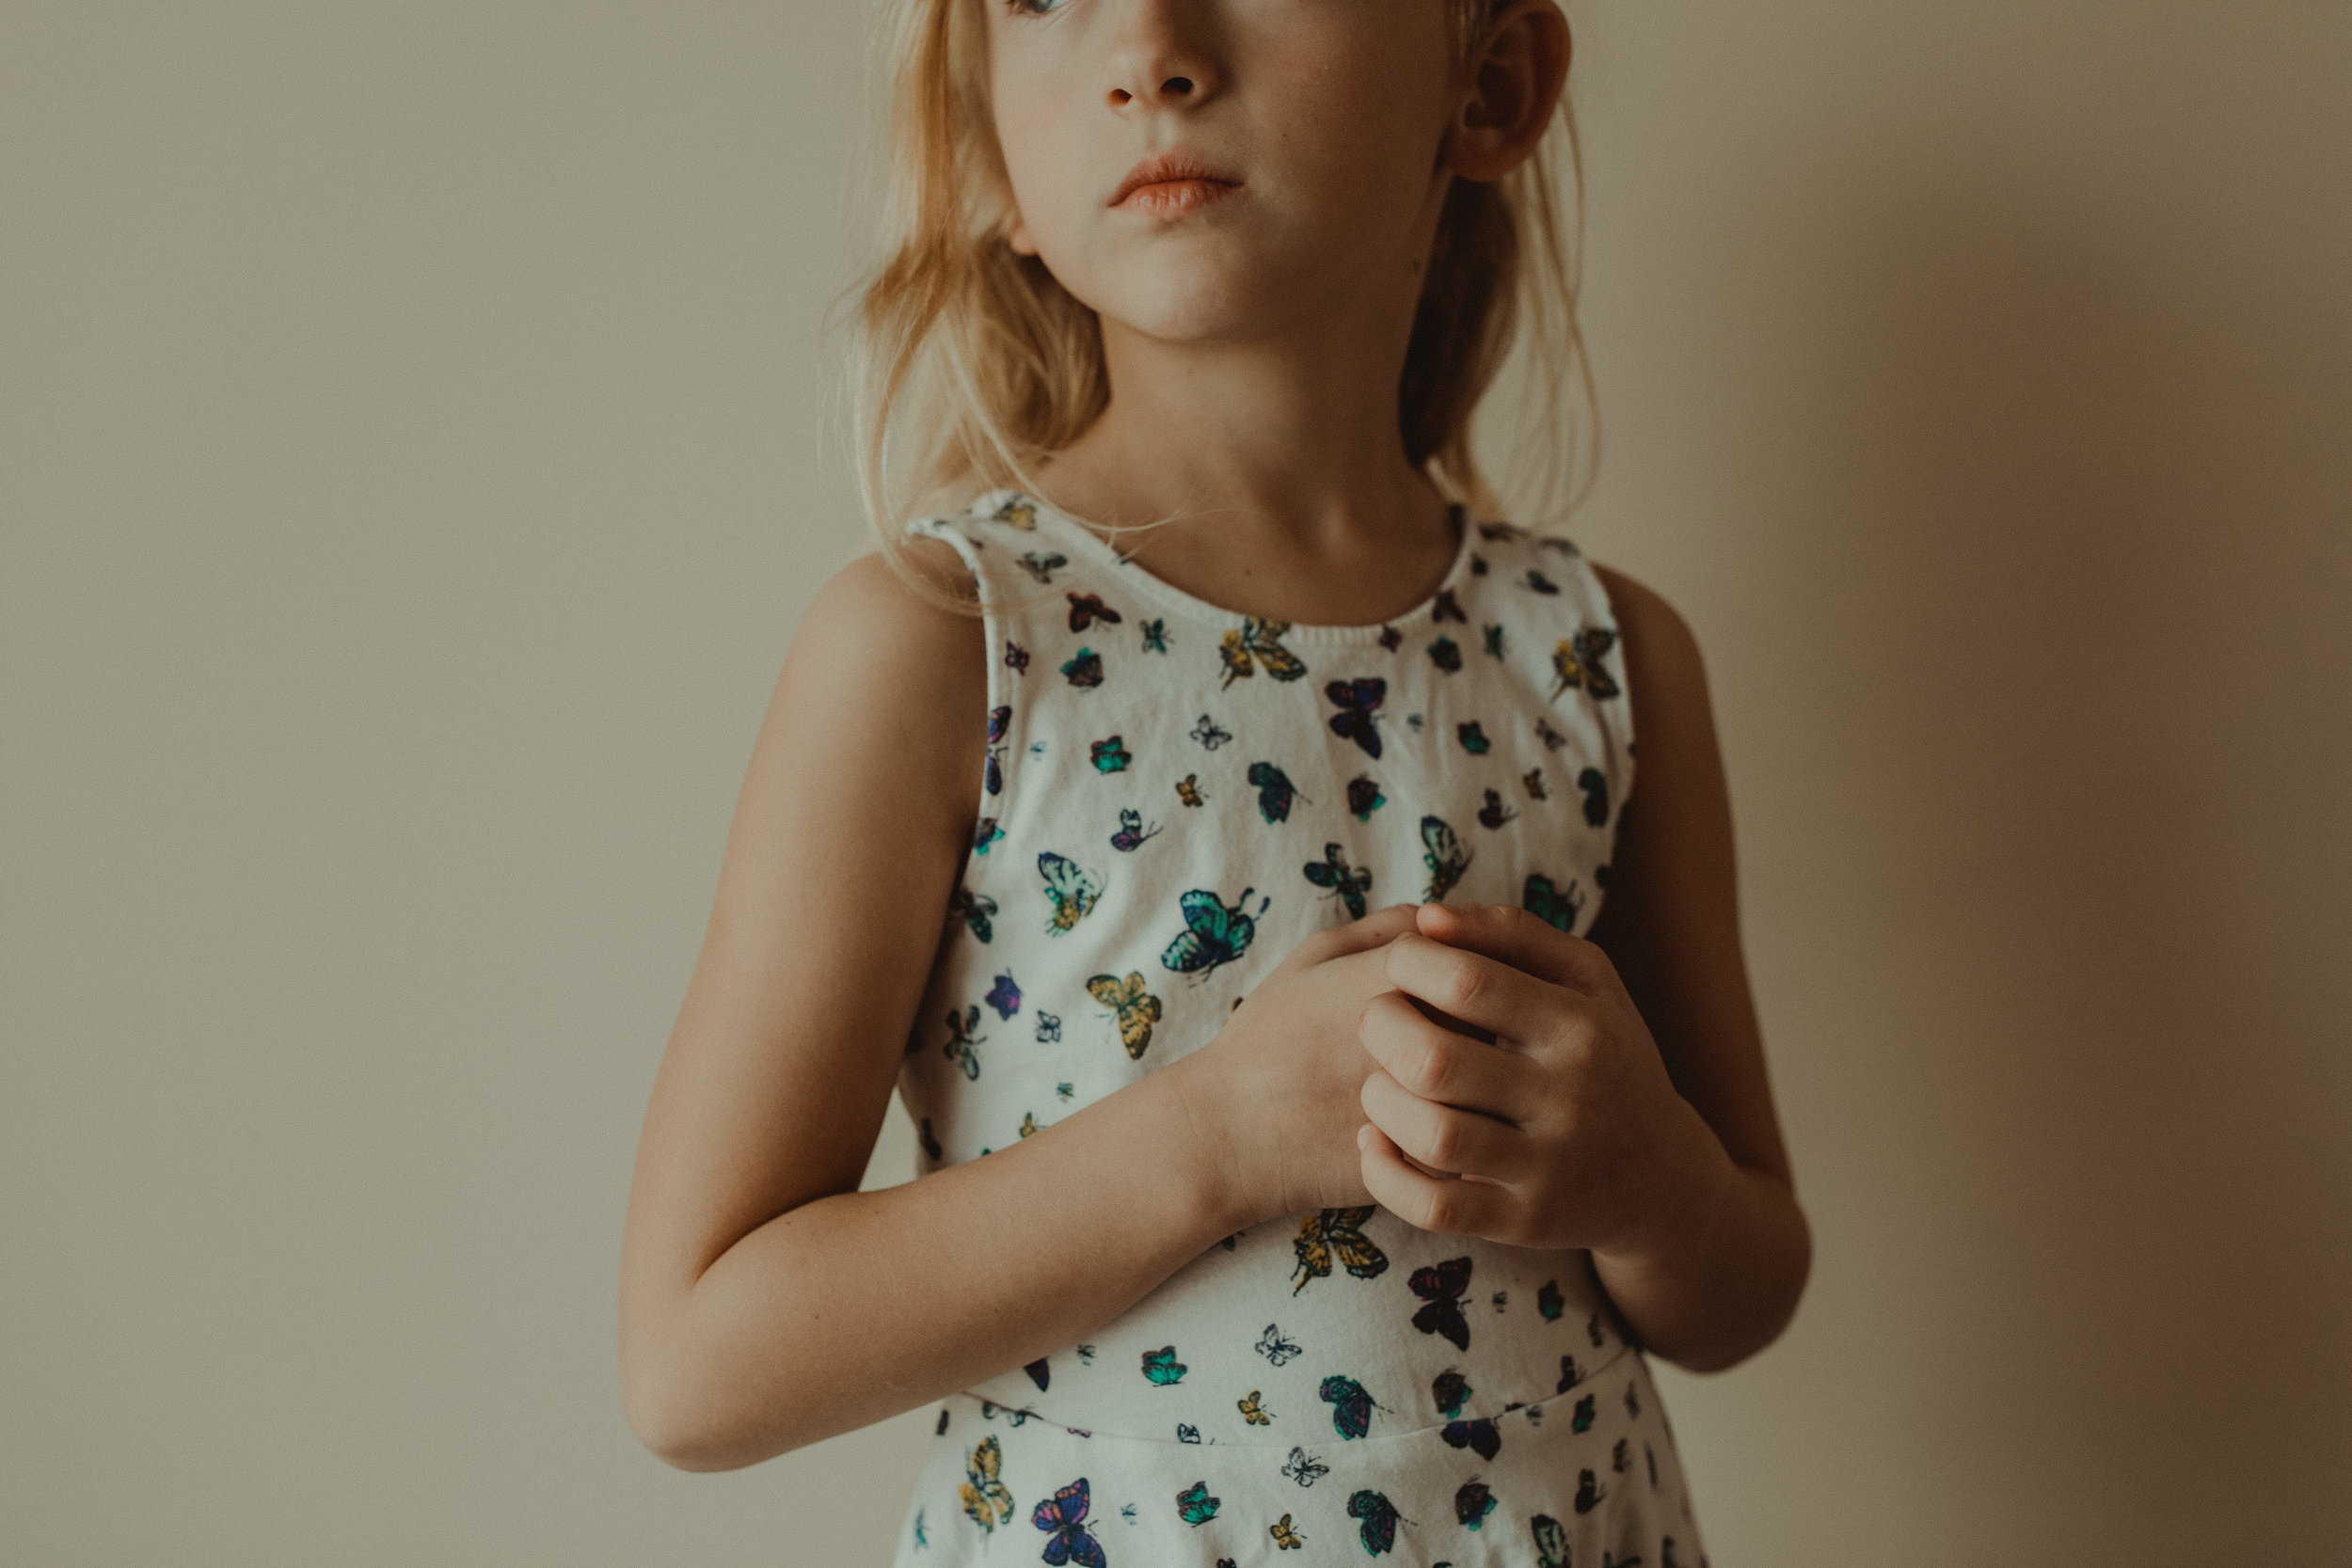 motherhood-self-portrait-33.jpg